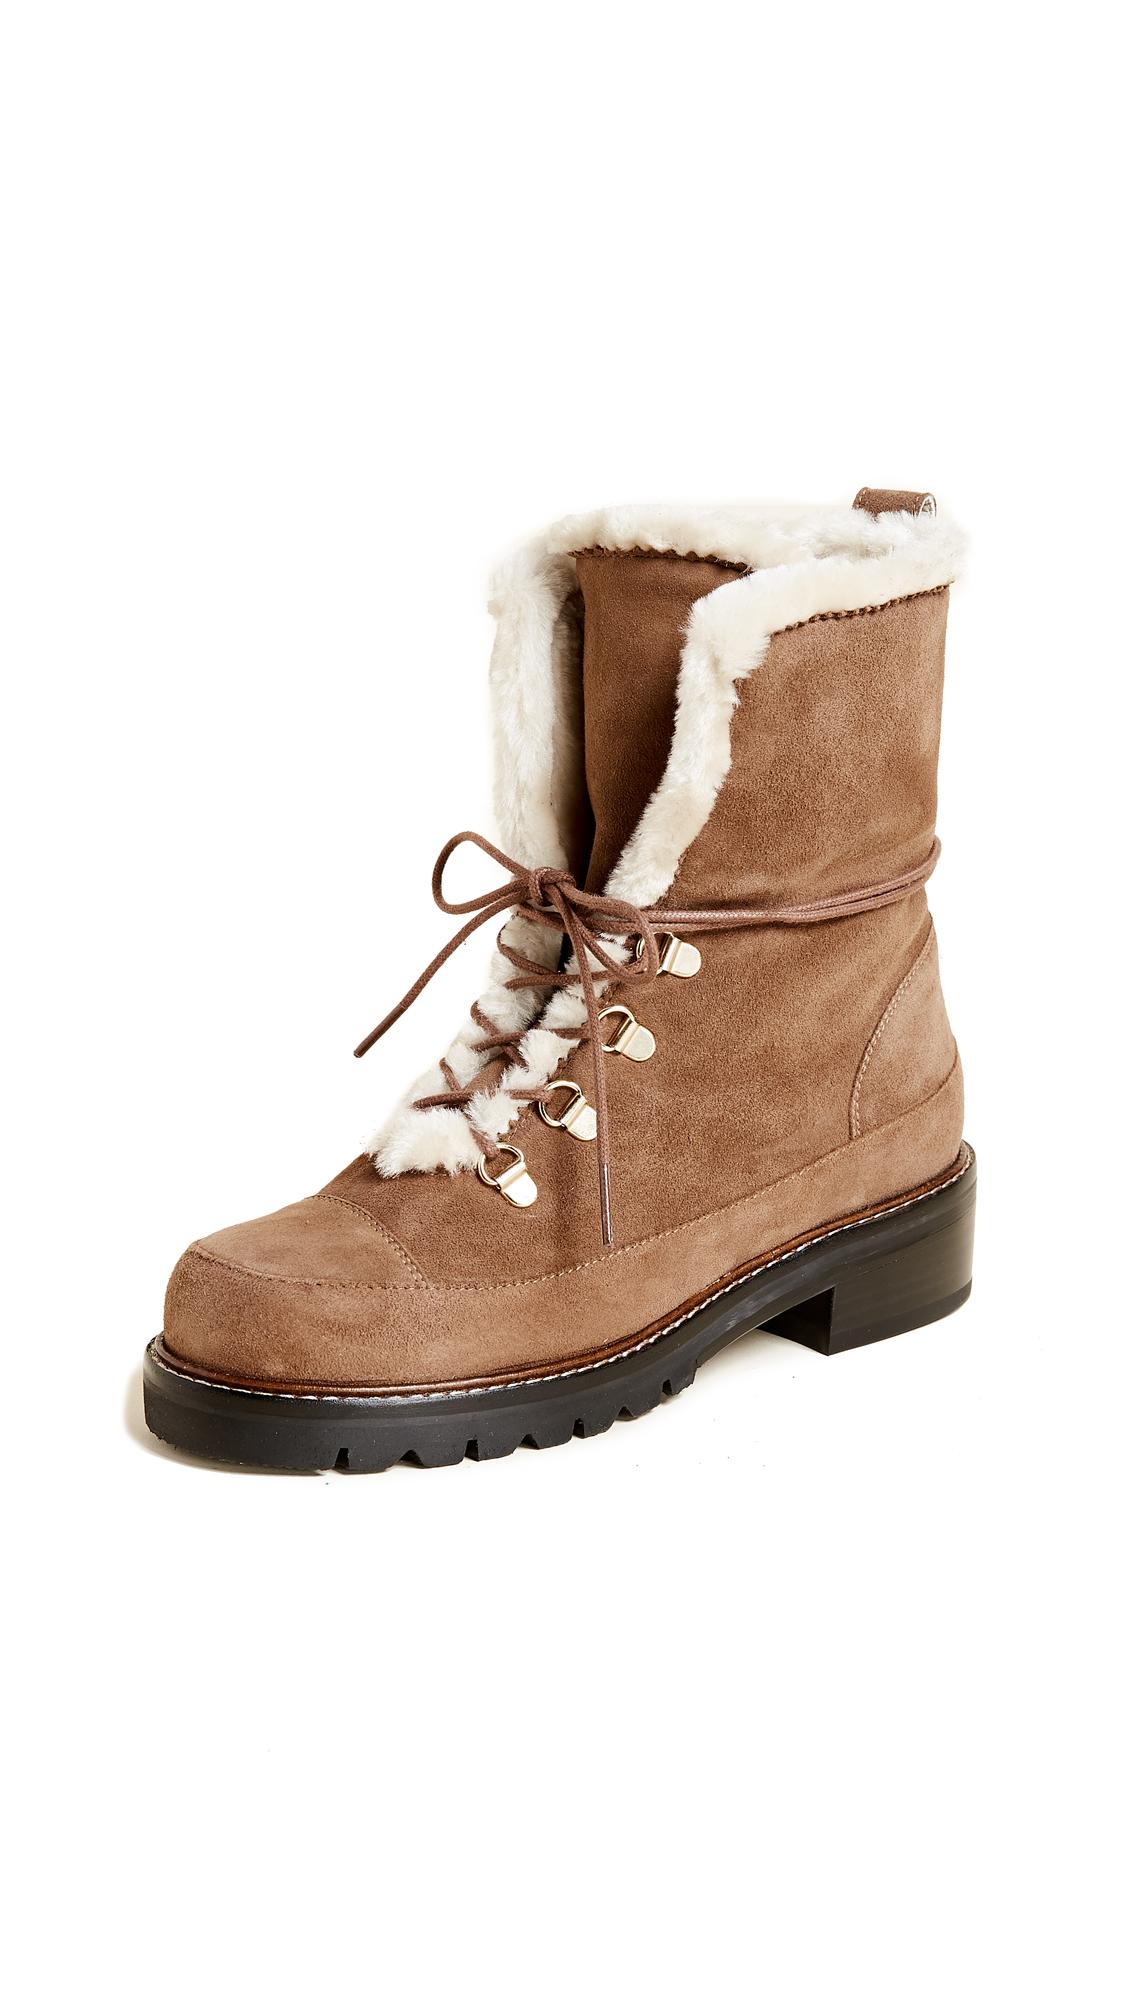 Stuart Weitzman Luge Hiking Boots - Nutmeg